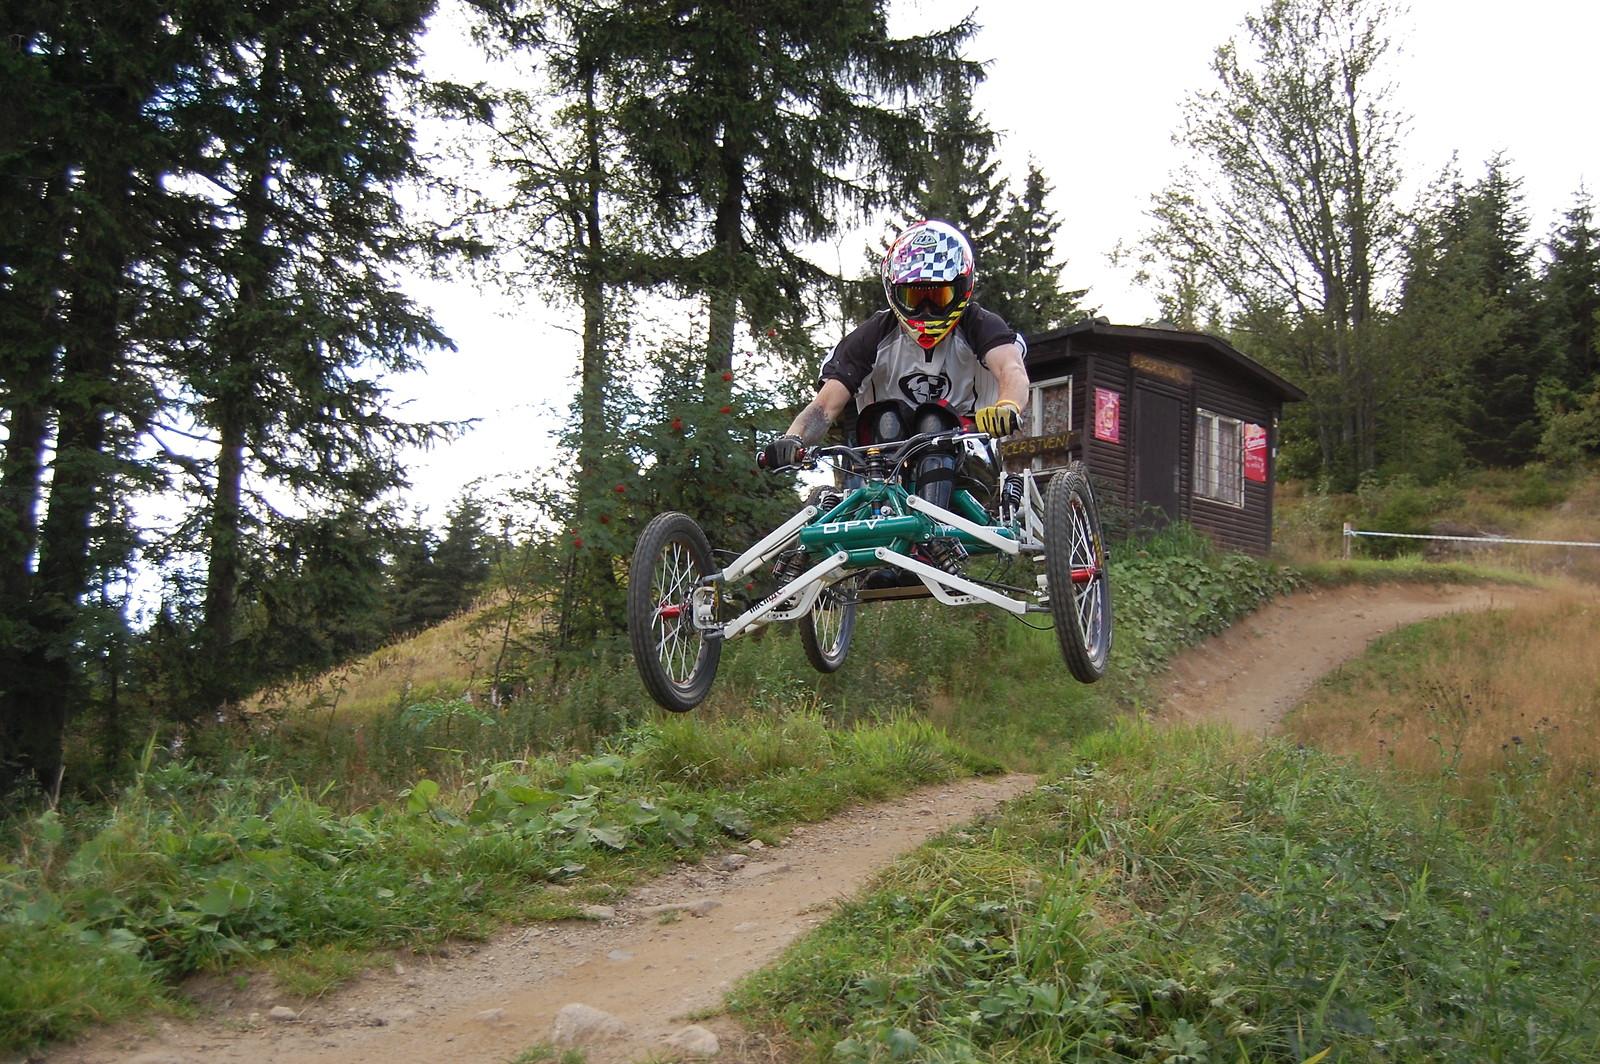 DSC 0006 - wozikmajkl83 - Mountain Biking Pictures - Vital MTB